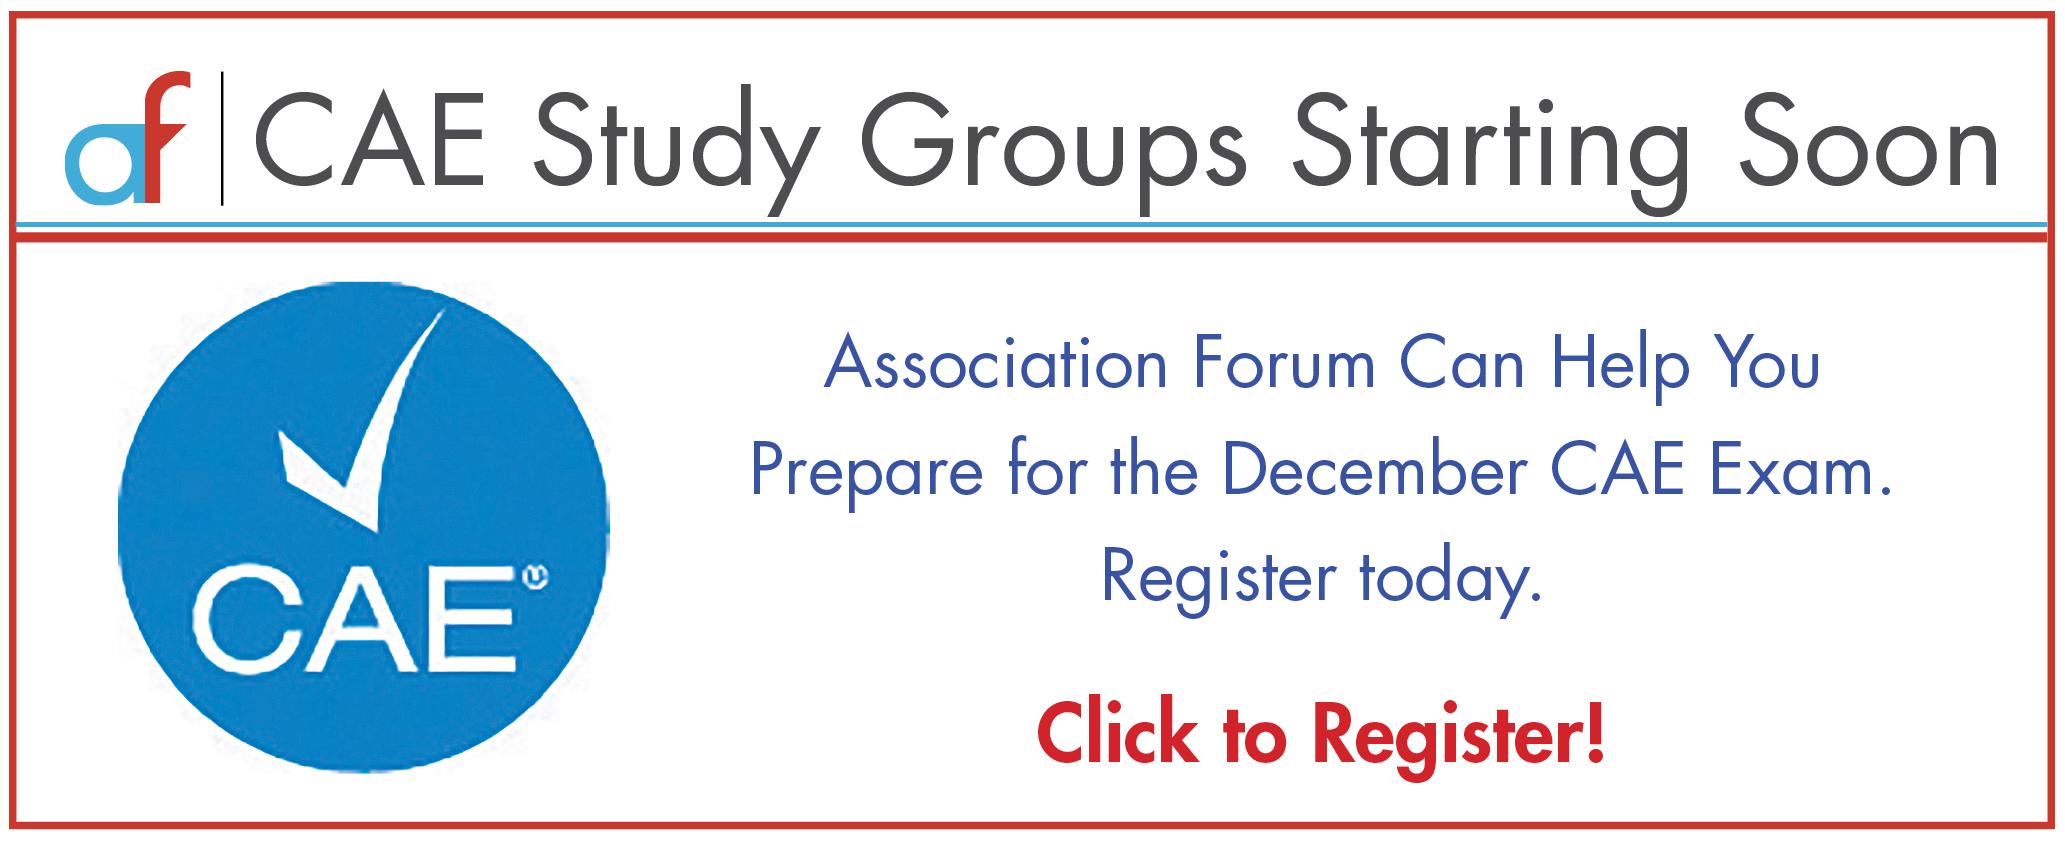 Cae Study Groups Association Forum